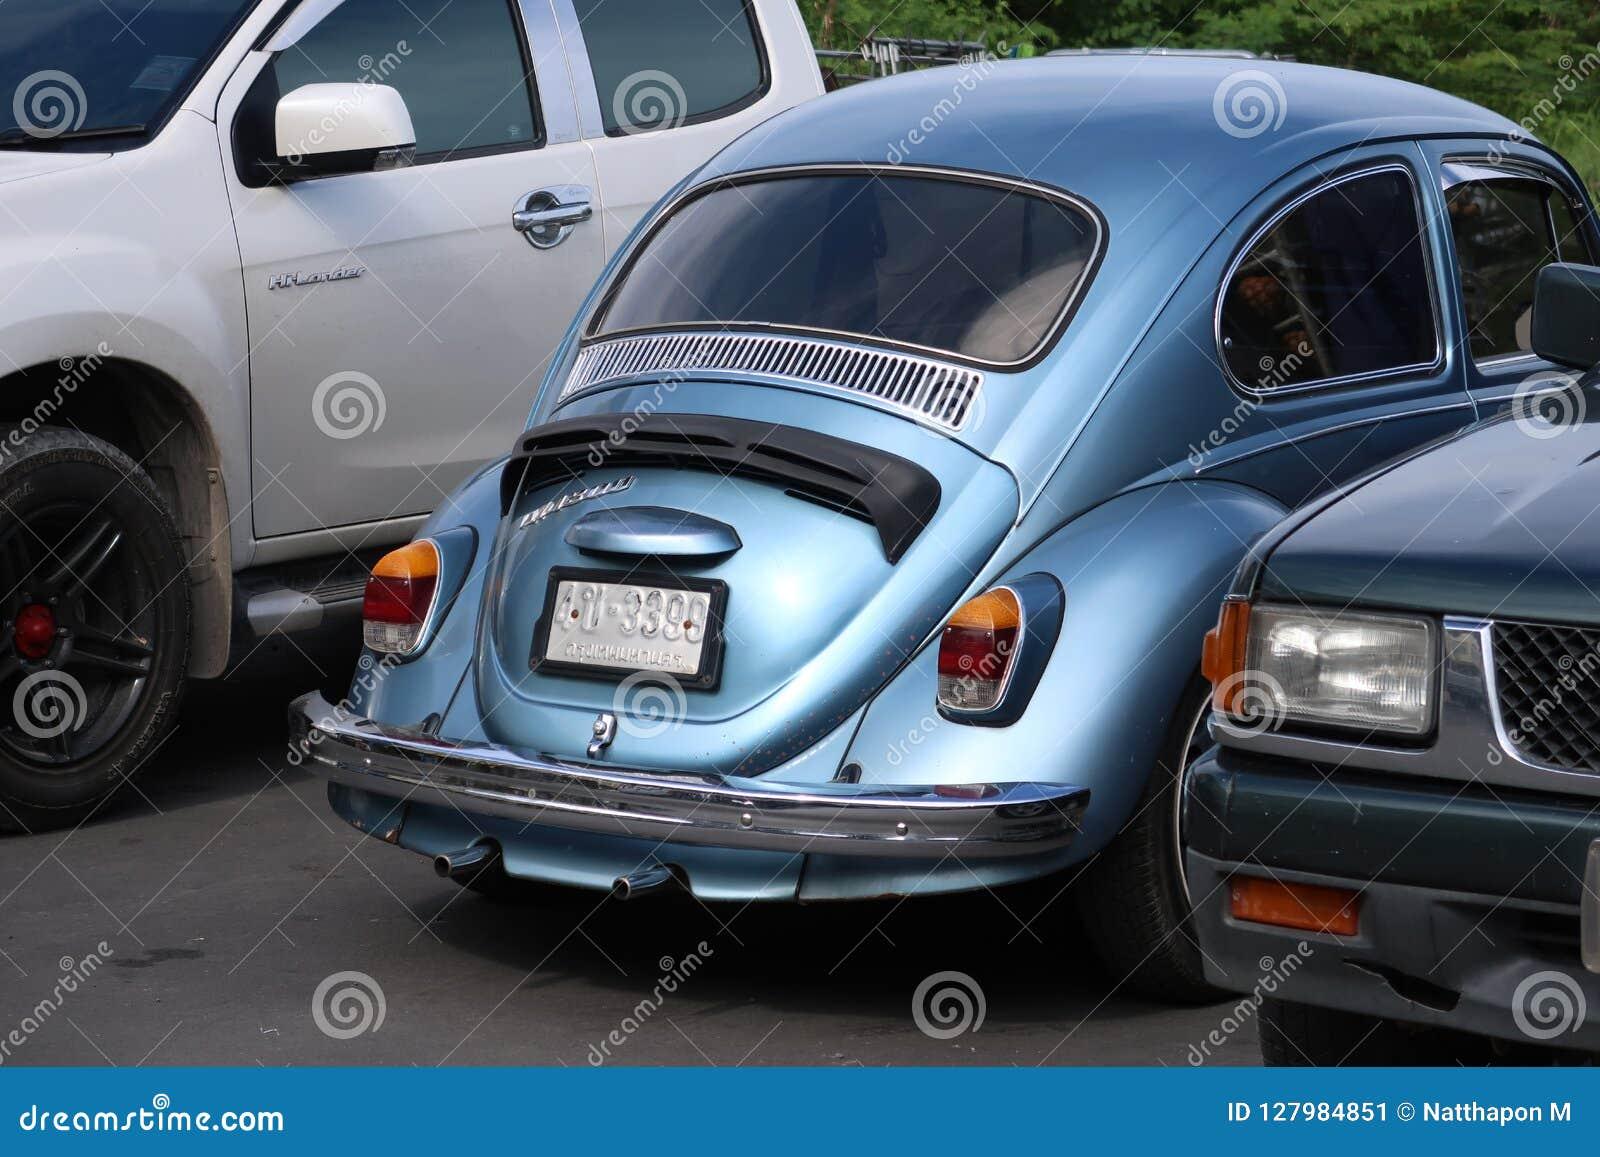 Klasyczny, błękitny Volkswagen Beetle samochód,